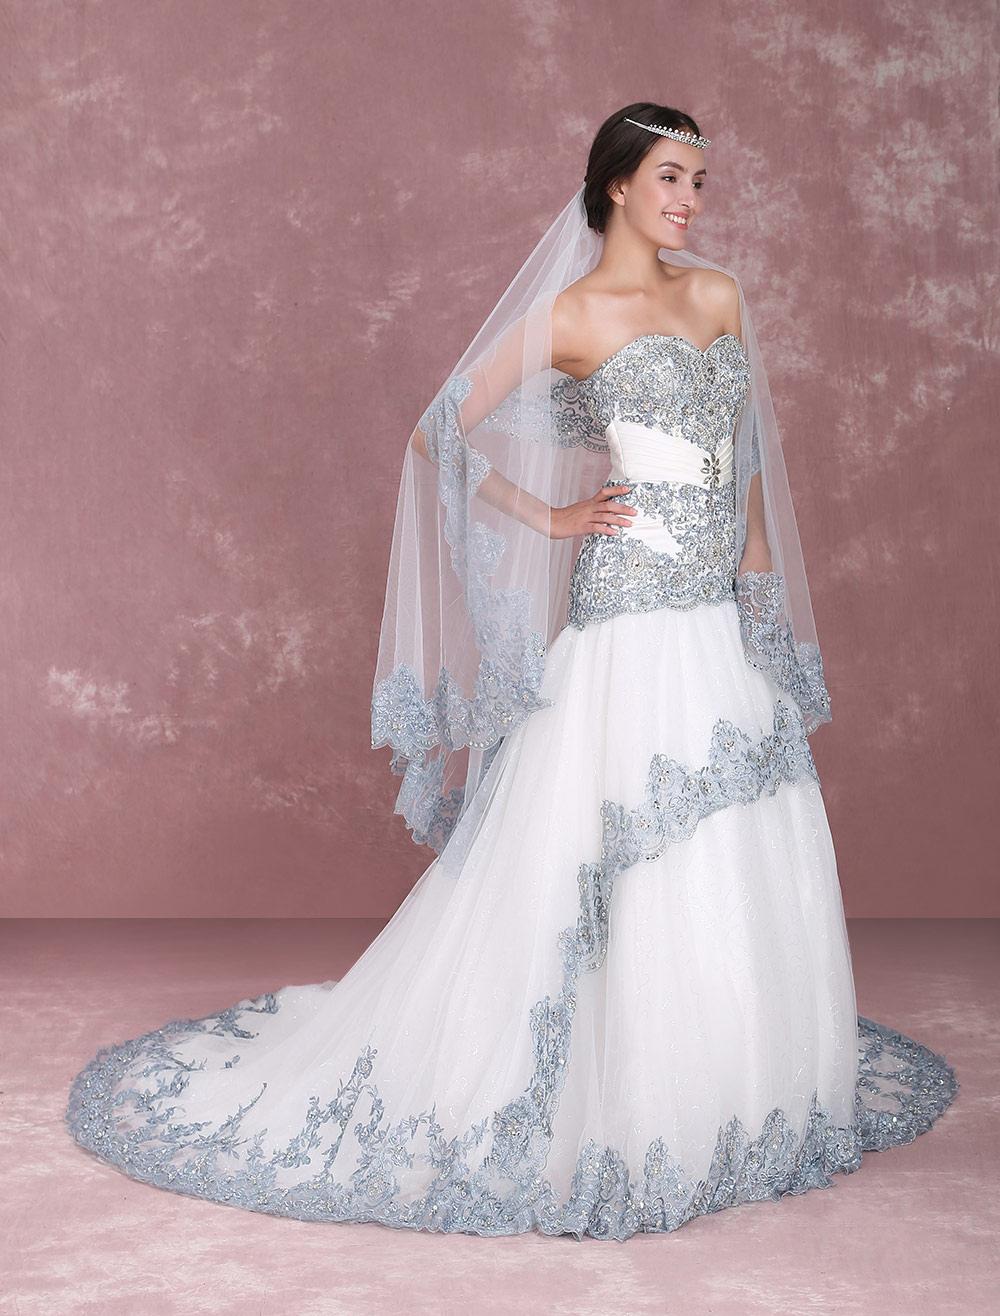 Sweetheart Strapless Lace Mermaid Wedding Dress with Rhinestones Detailing Milanoo